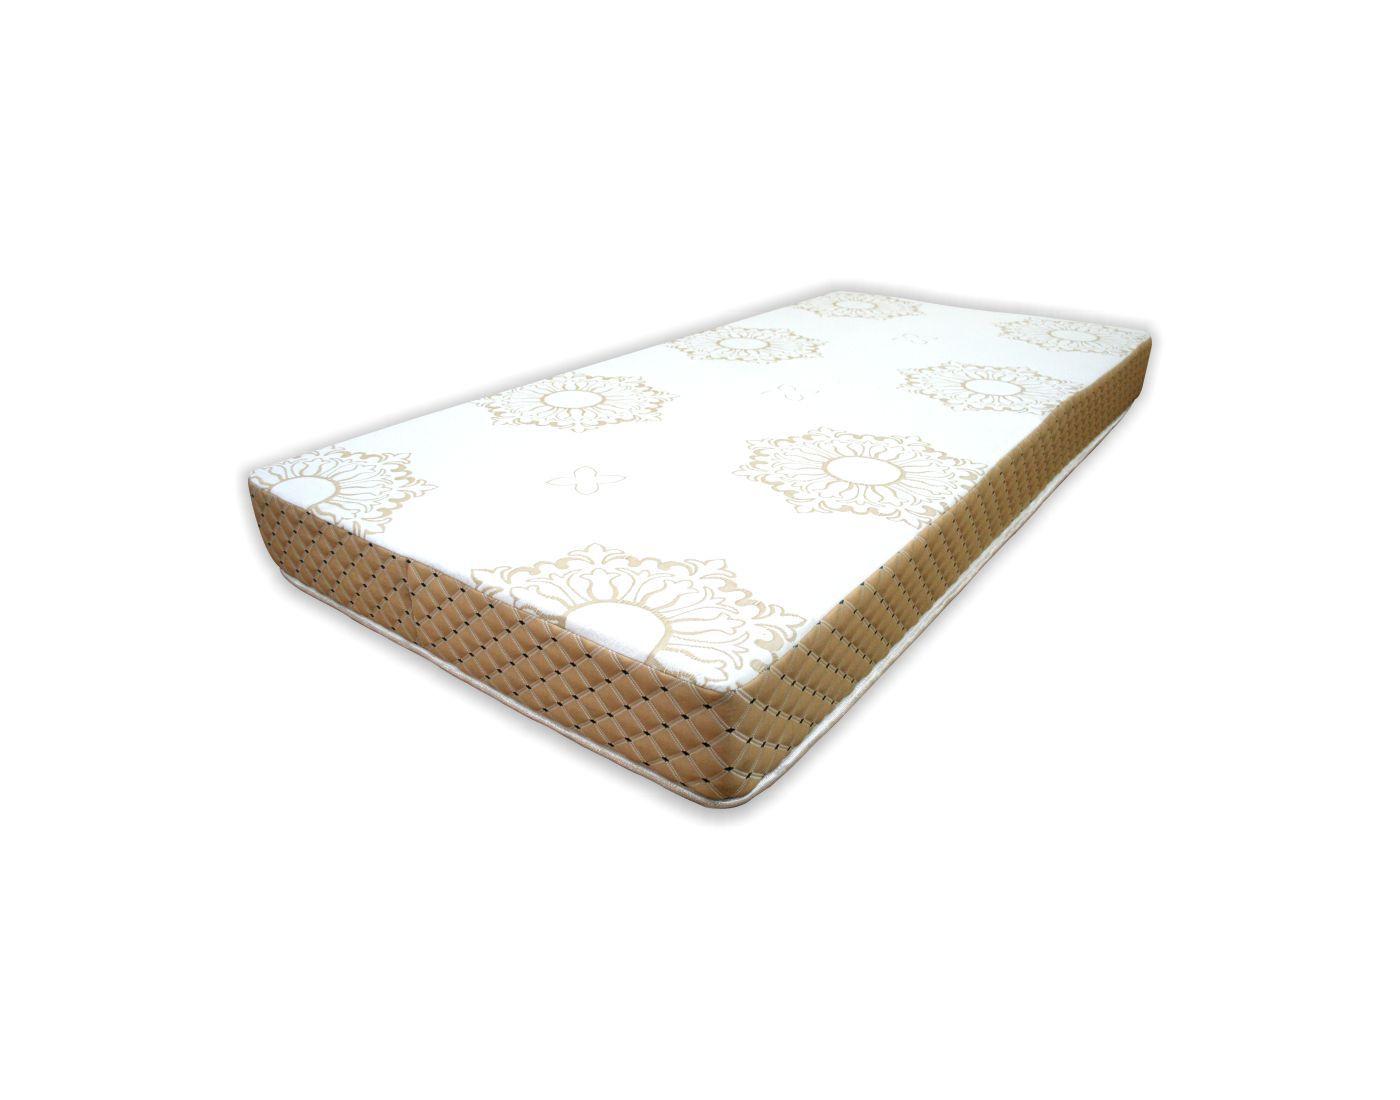 sleep spa premium orthopedic cooling gel 10 inches memory foam